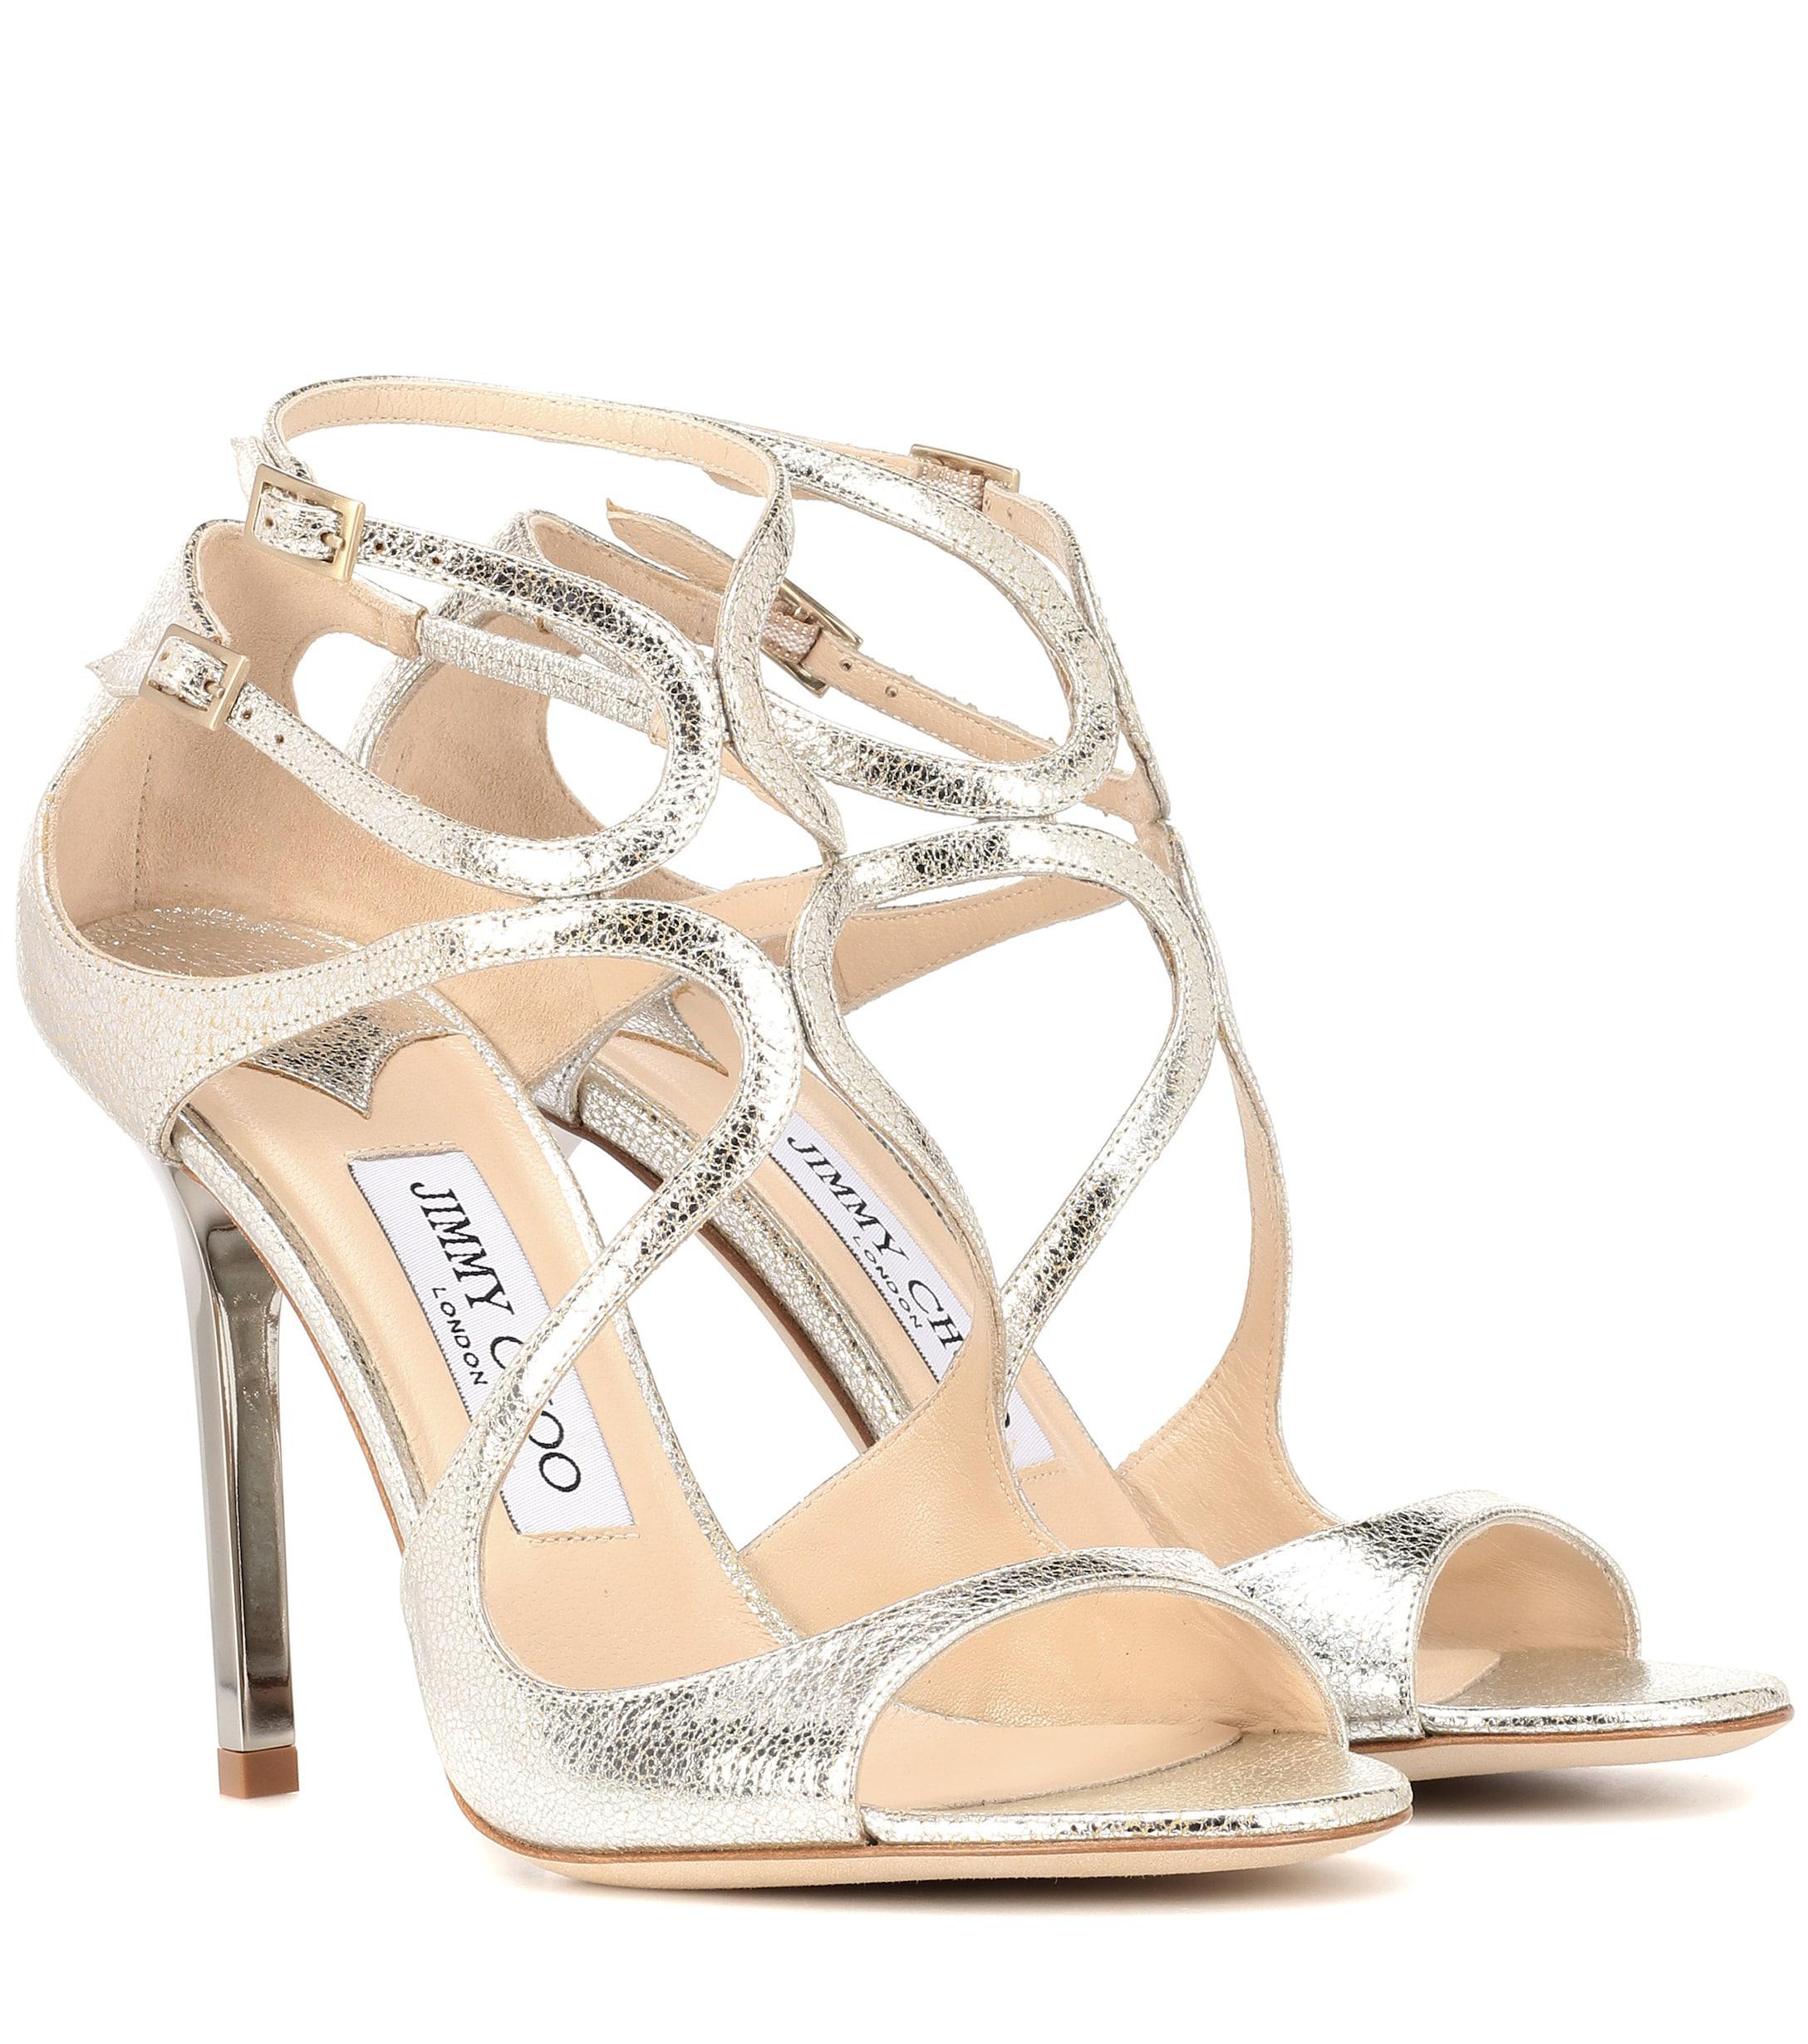 size 40 a6bc4 e48ea jimmy-choo-champagne-Lang-Metallic-Leather-Sandals.jpeg